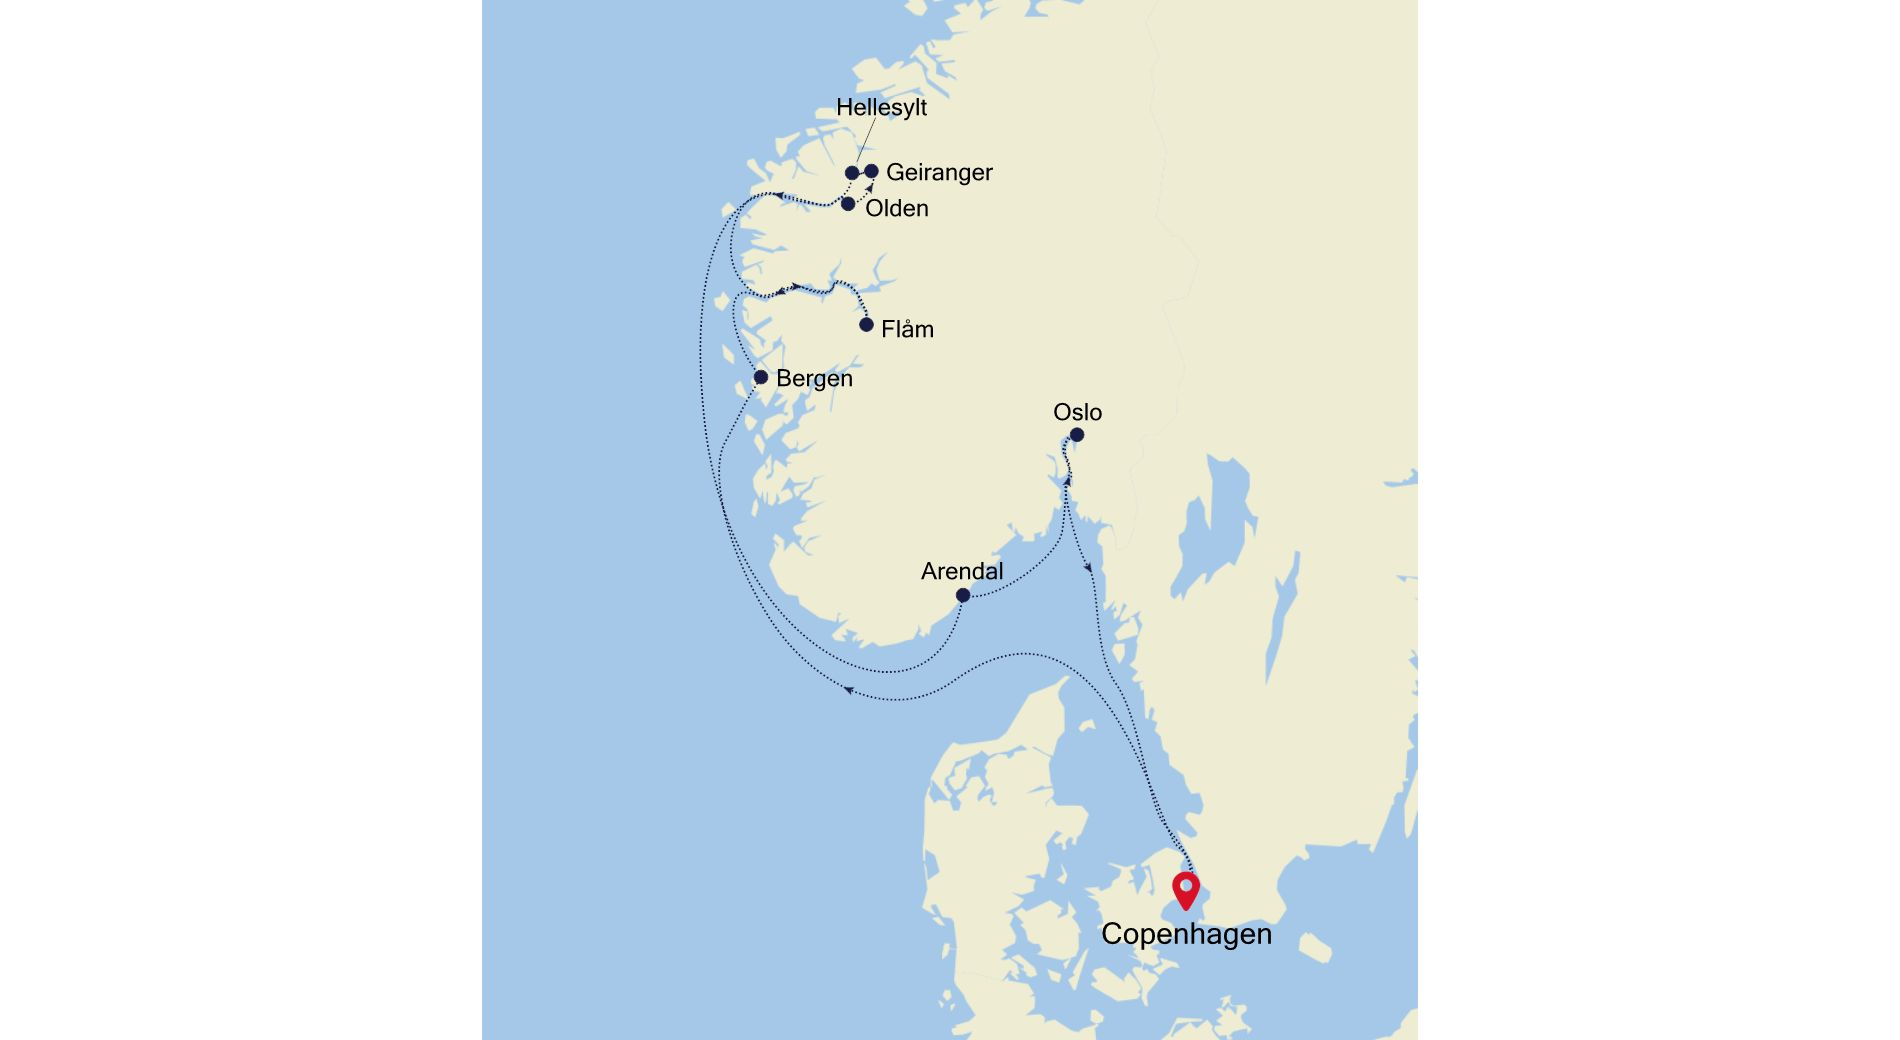 SL210706010 - Copenhagen nach Copenhagen